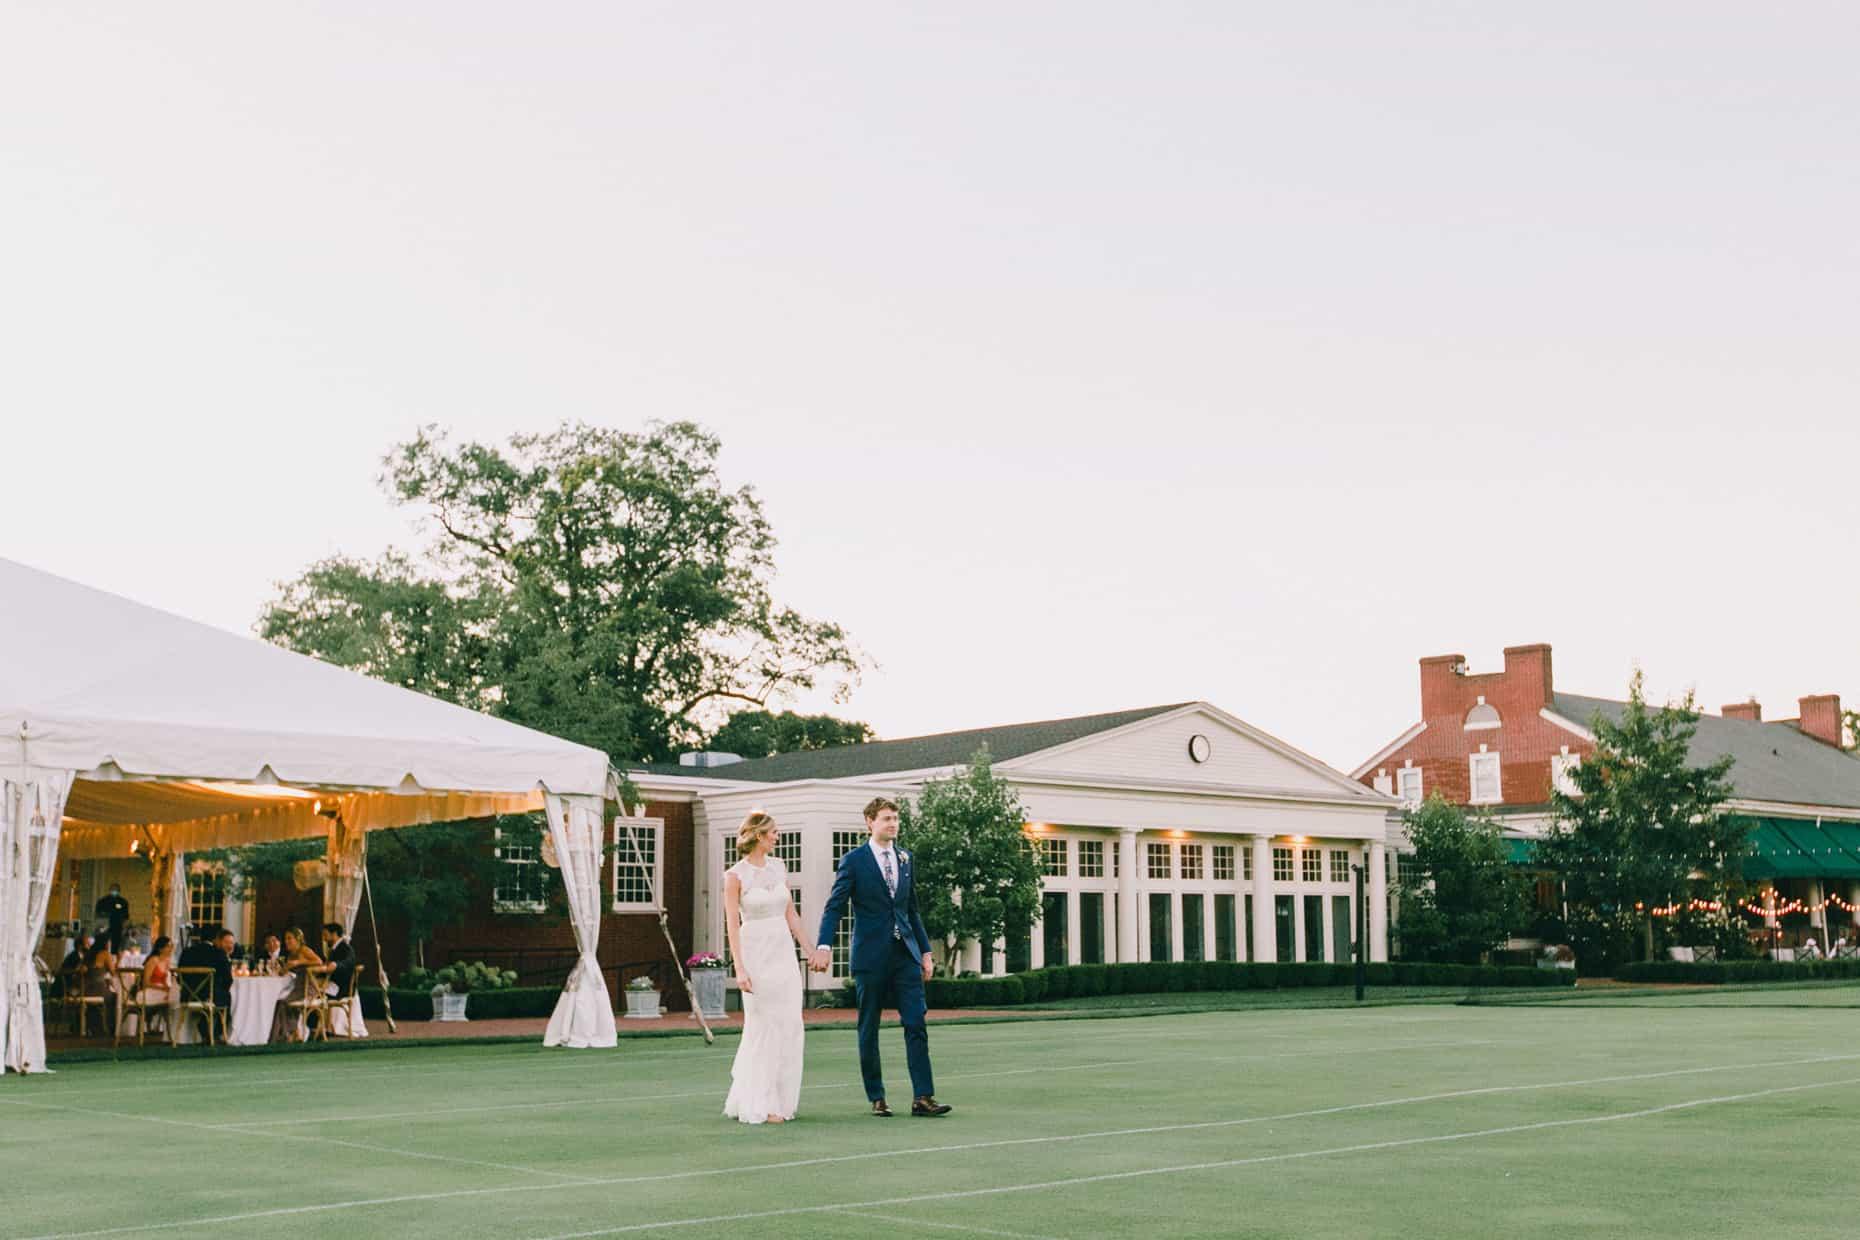 Philadelphia Cricket Club Wedding Reception